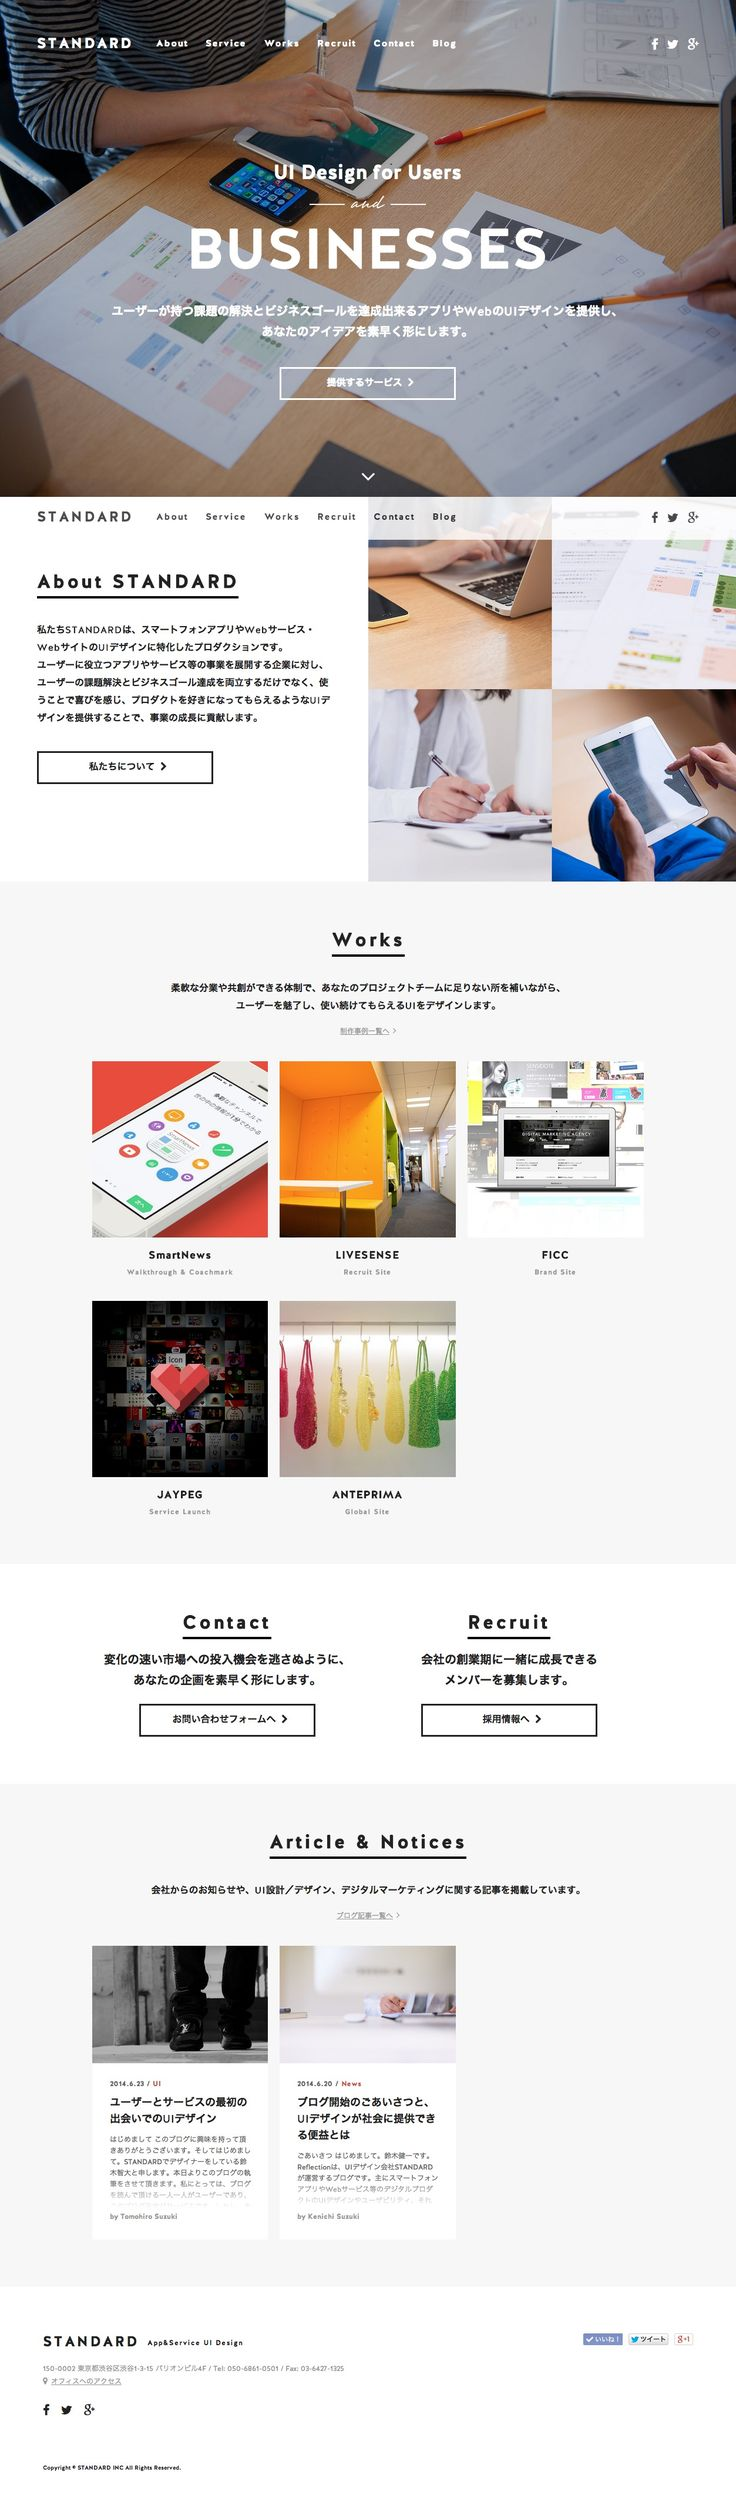 Standard Inc アプリやWebサービスのUIデザイン会社 http://www.standardinc.jp/